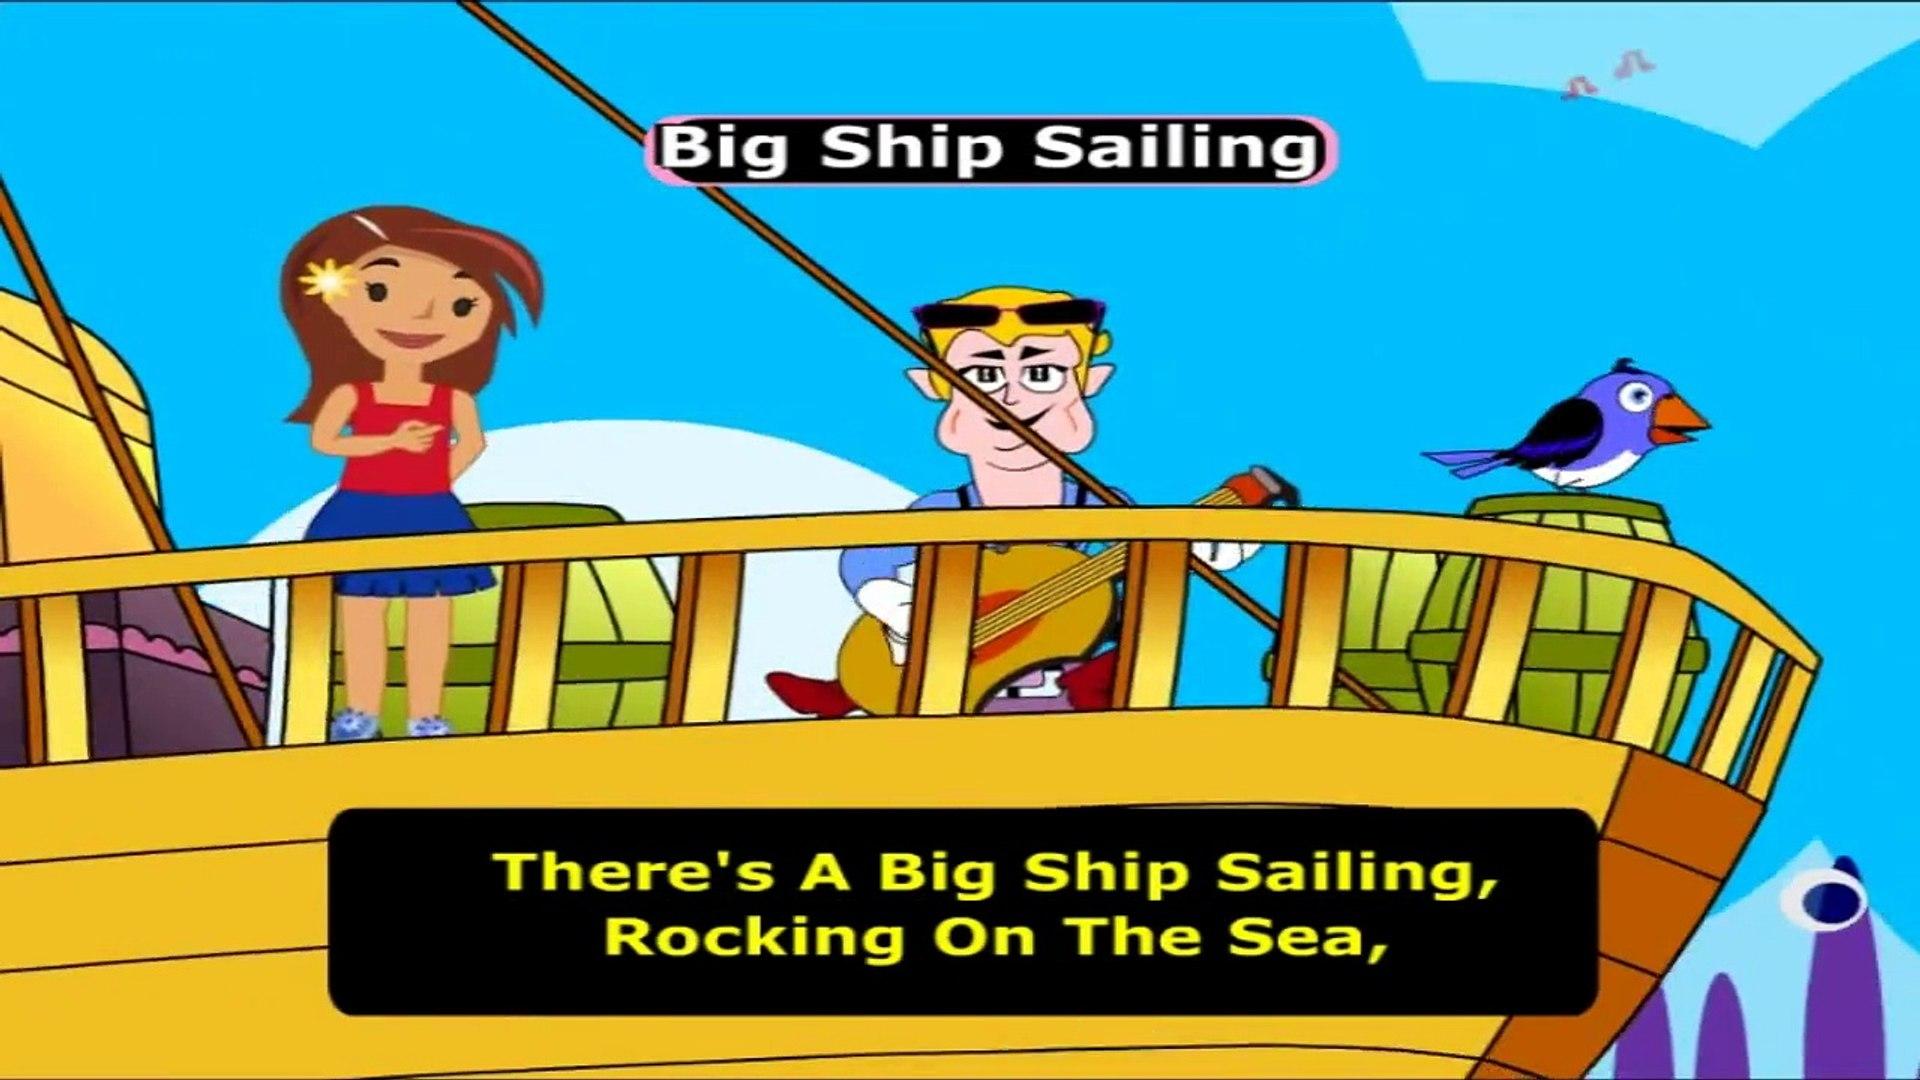 Big Ship Sailing ## Famous English Rhyme - Videos For Kids Education